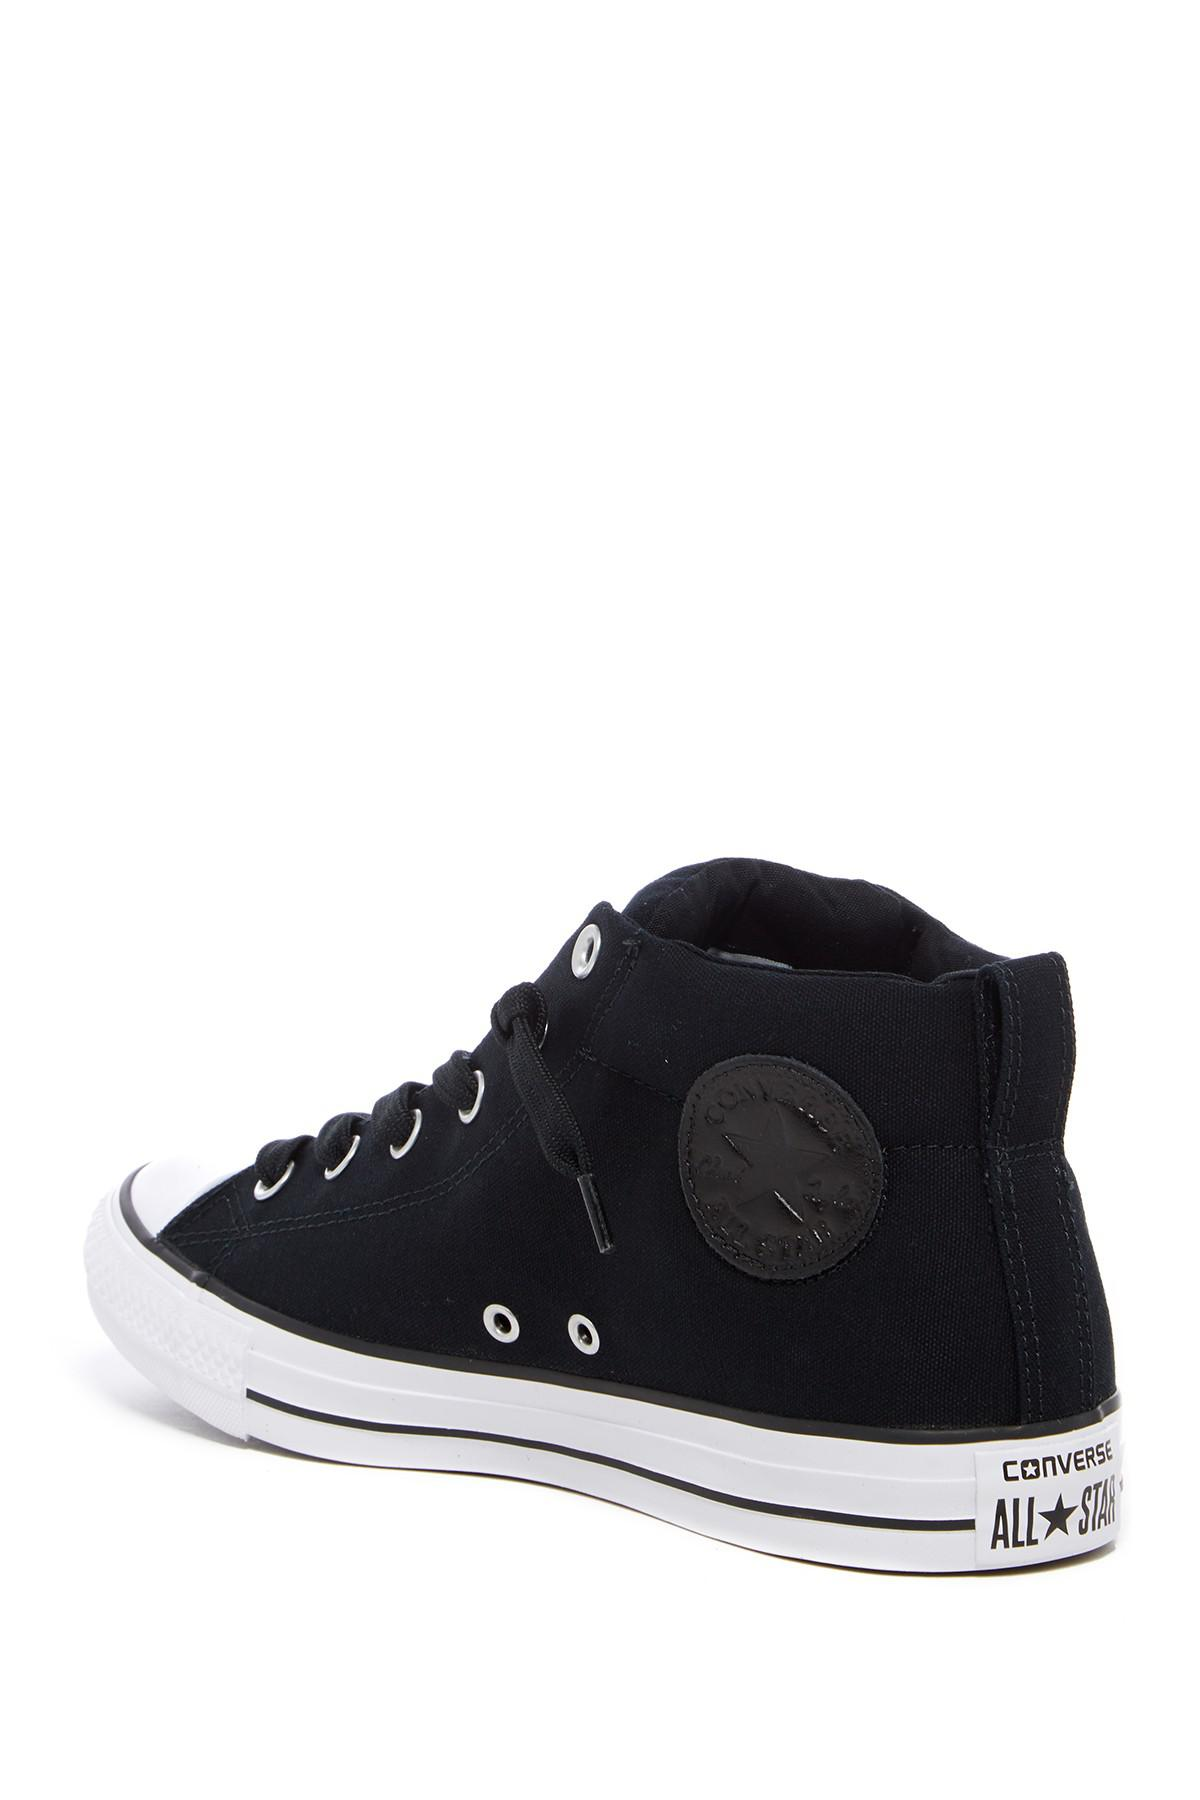 1b804d0d14b1 Converse - Black Chuck Taylor All Star Street Sneaker (unisex) - Lyst. View  fullscreen